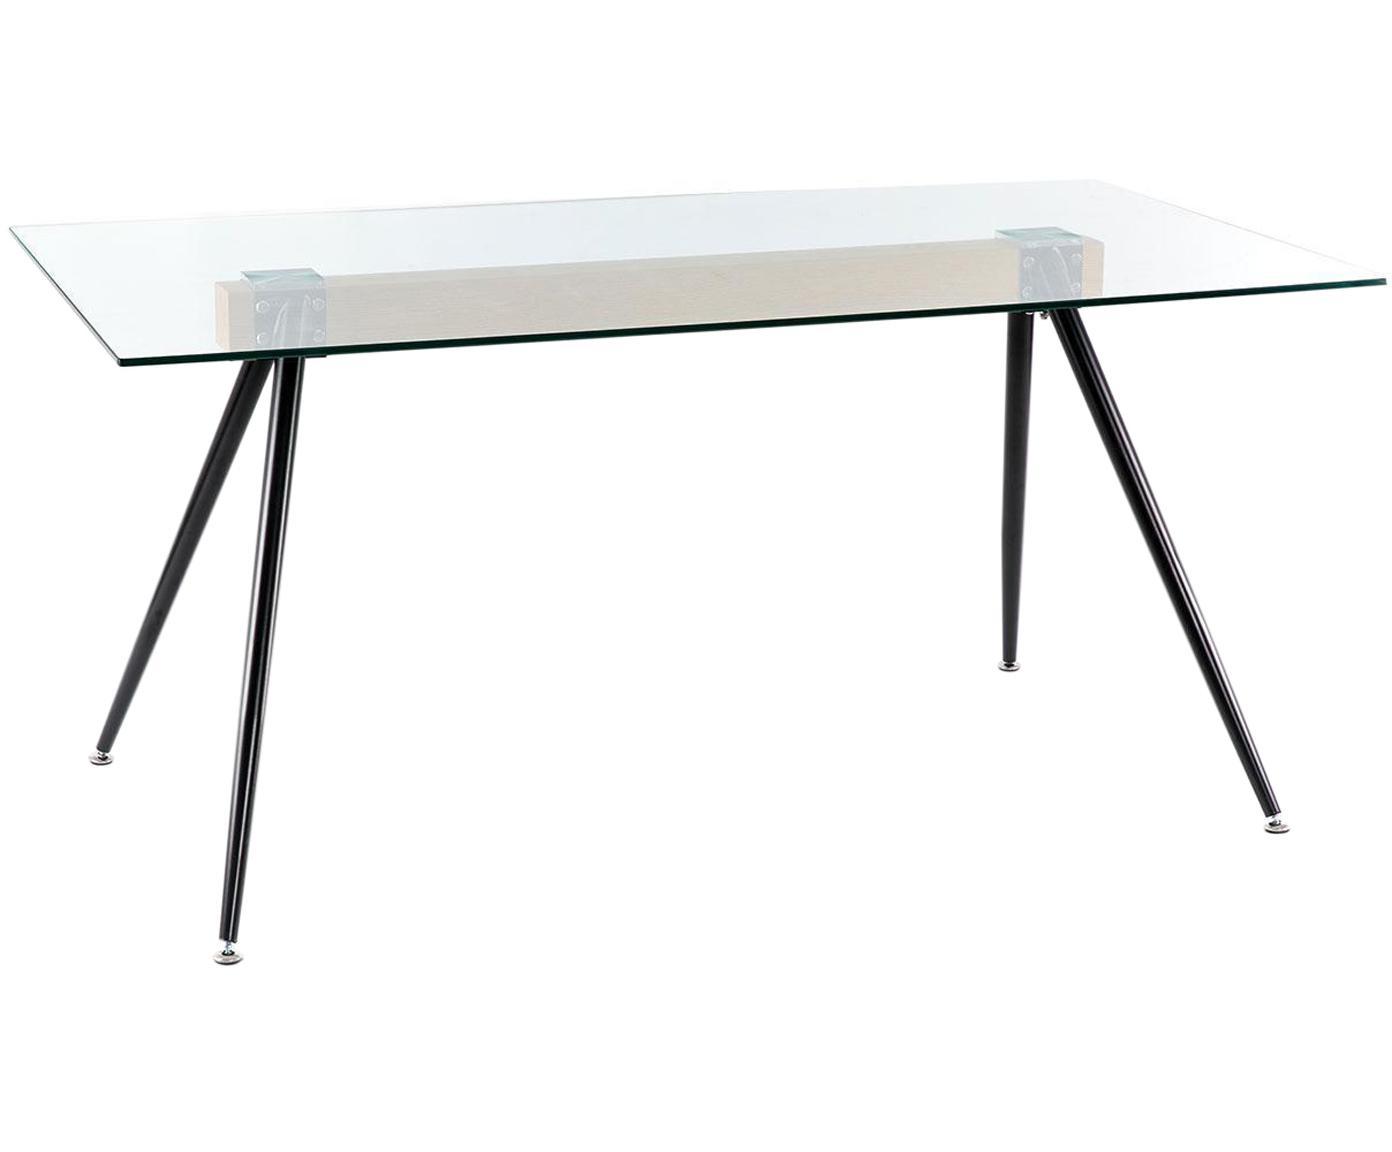 Mesa de comedor Mila, tablero de cristal, Tablero: cristal templado, Patas: hierro, Natural, negro, An 160 x F 90 cm